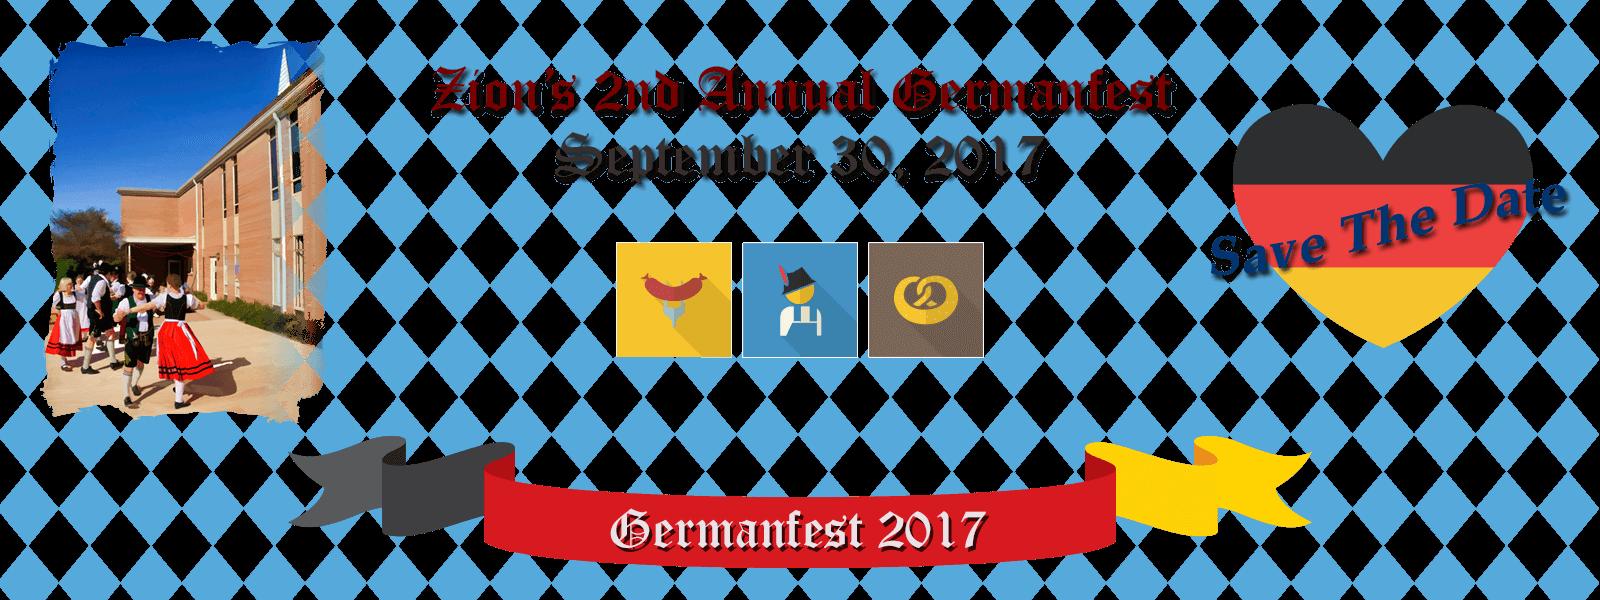 Germanfest 09/30/2017